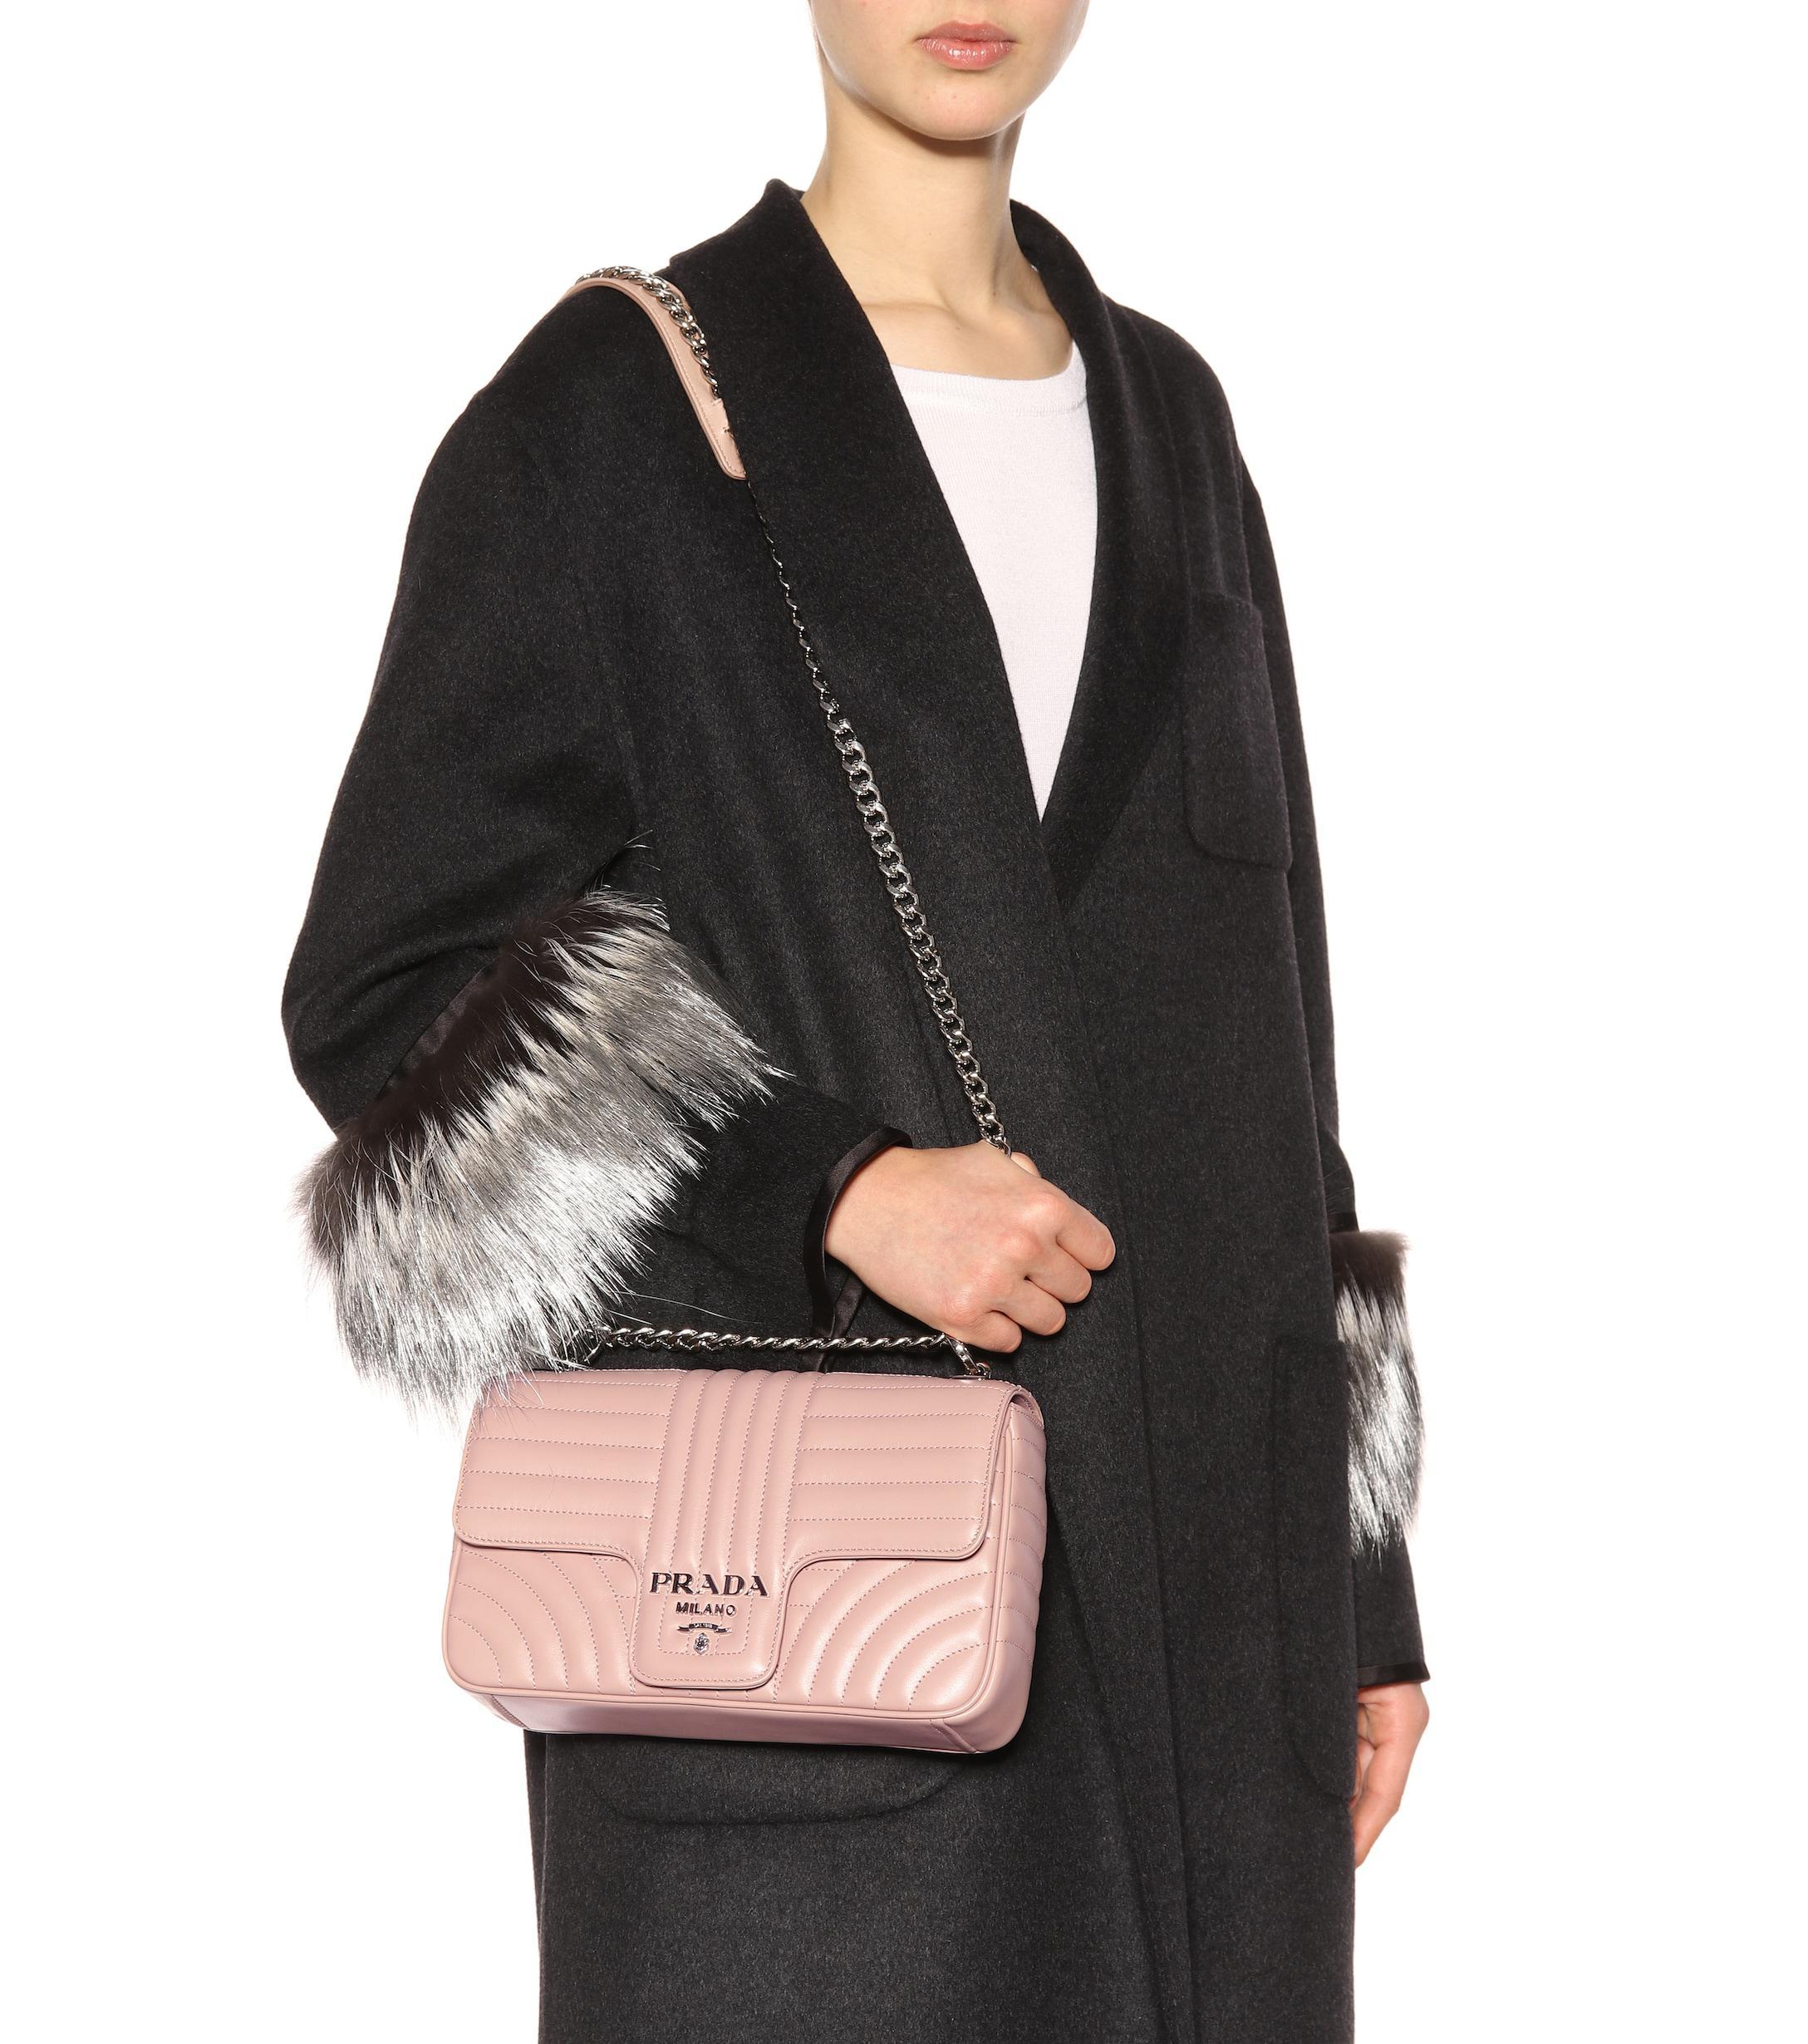 Prada - Pink Diagramme Medium Leather Shoulder Bag - Lyst. View fullscreen 7b5ef7ea6e9c6